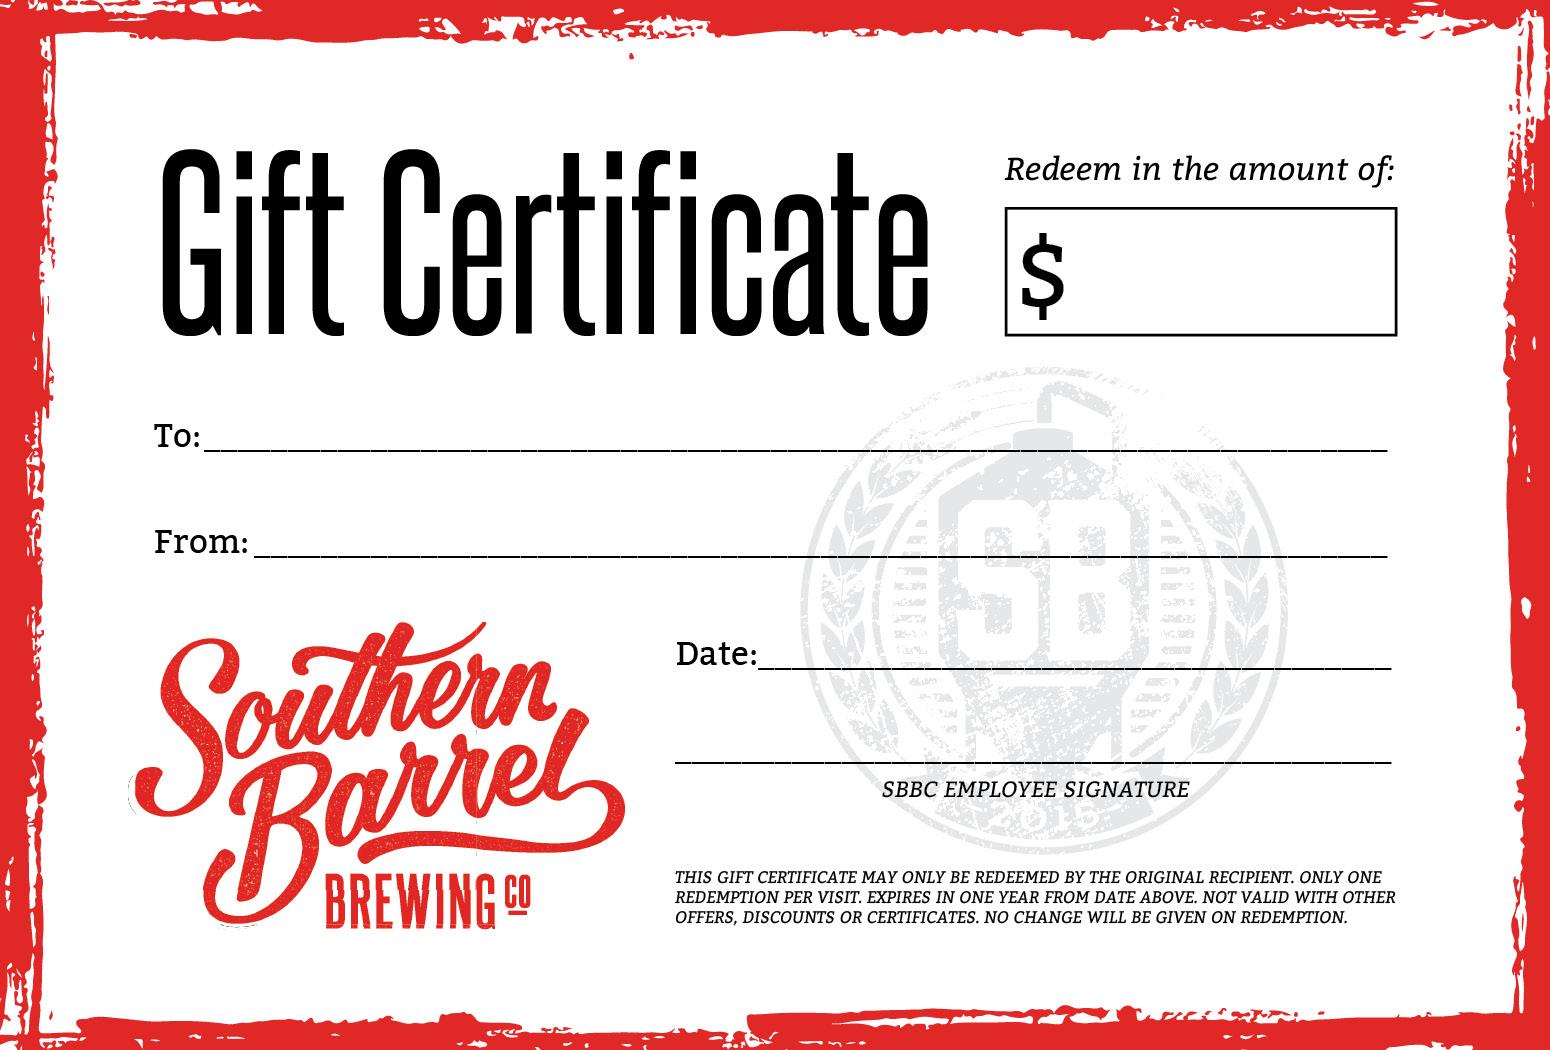 SBBC Gift Certificate.jpg